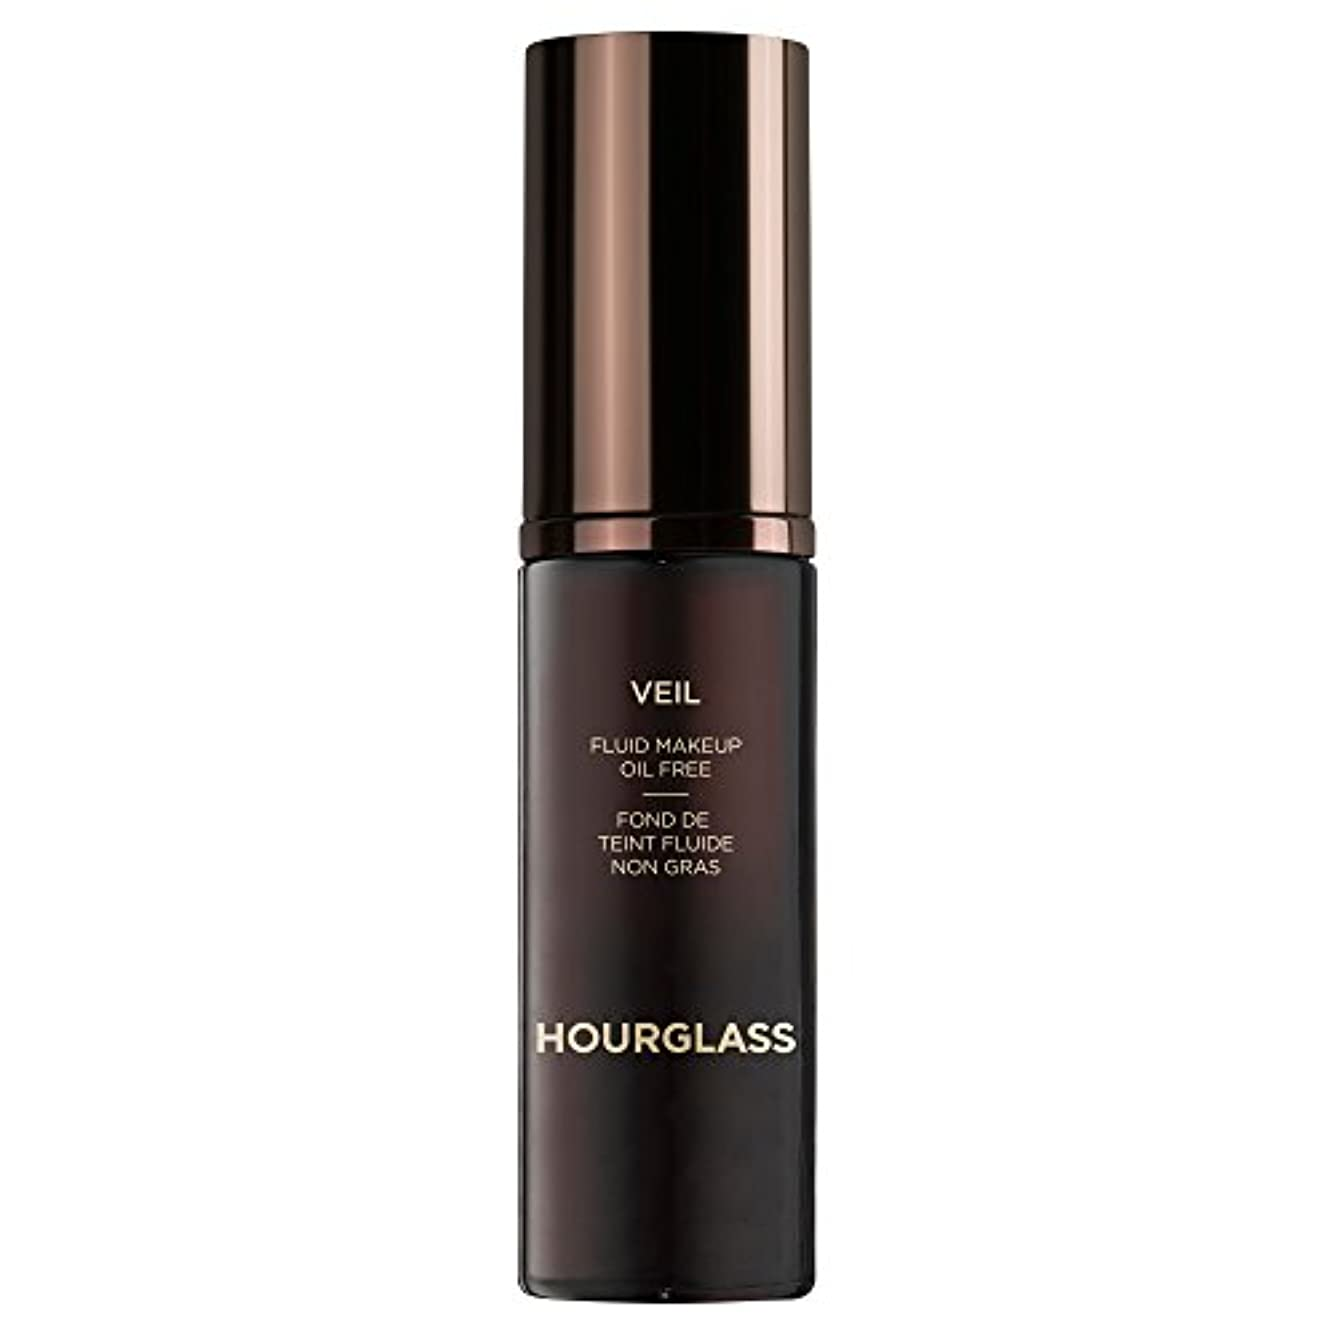 性別送金奇跡流体化粧栗ベール砂時計 (Hourglass) - Hourglass Veil Fluid Makeup Chestnut [並行輸入品]